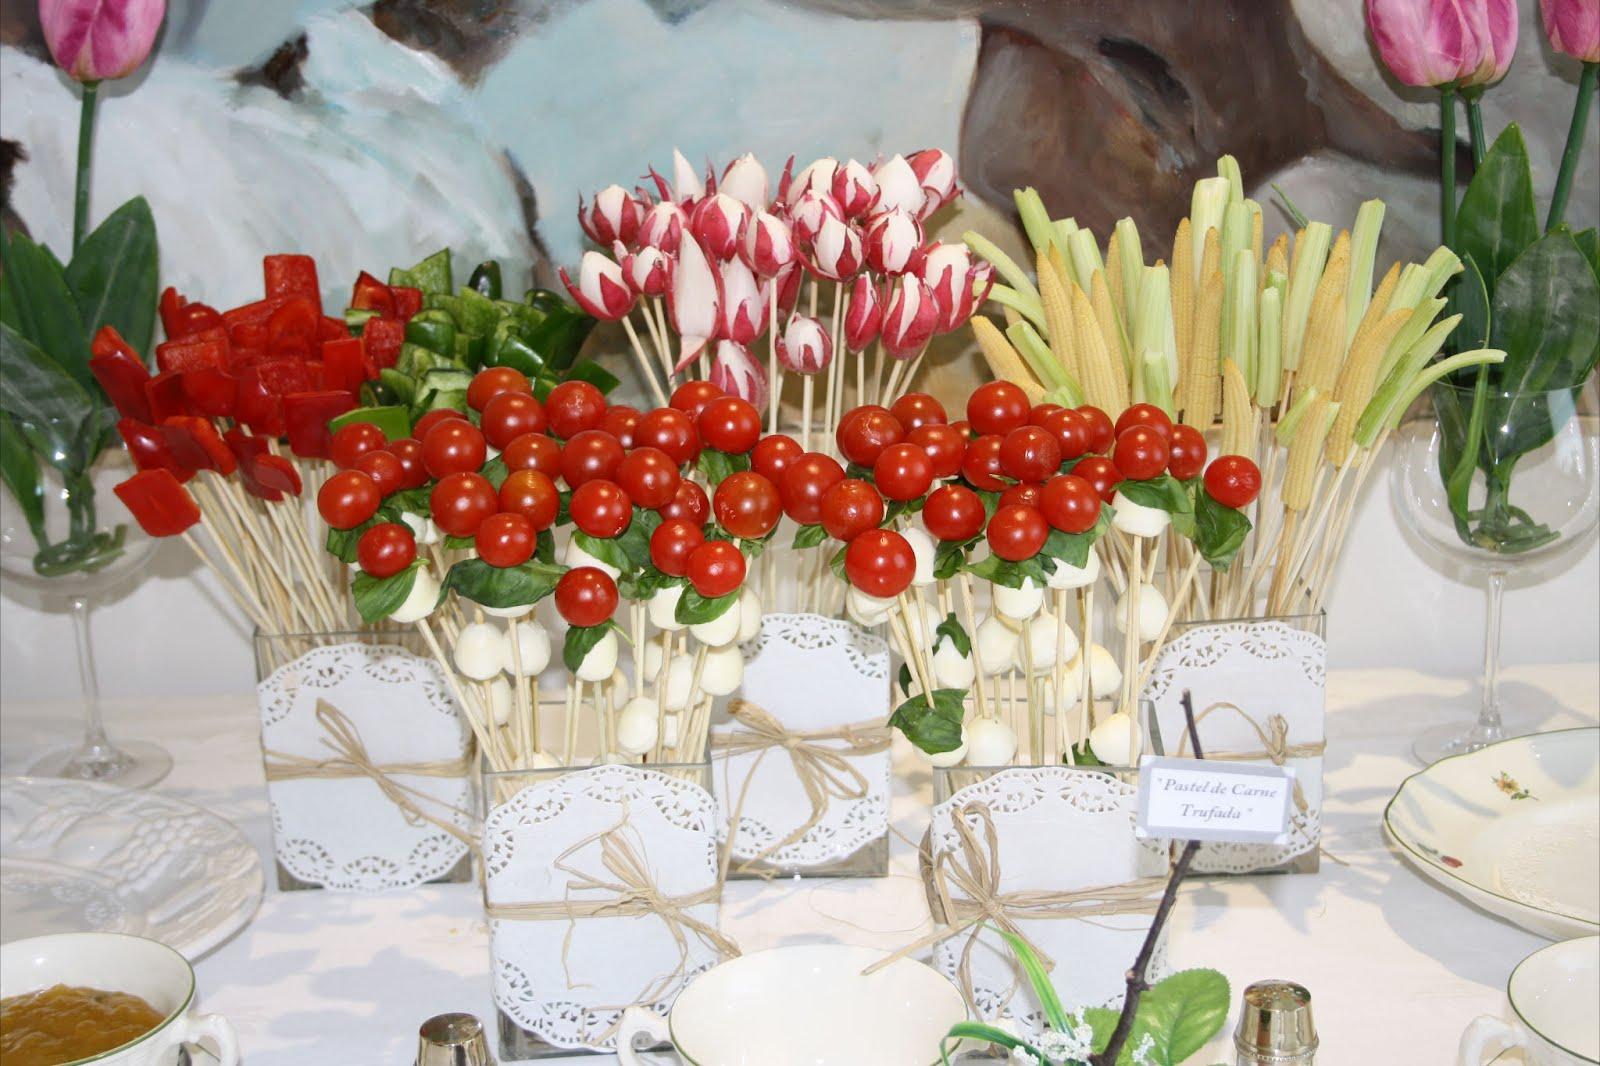 La fiesta de marieta for Casa jardin buffet